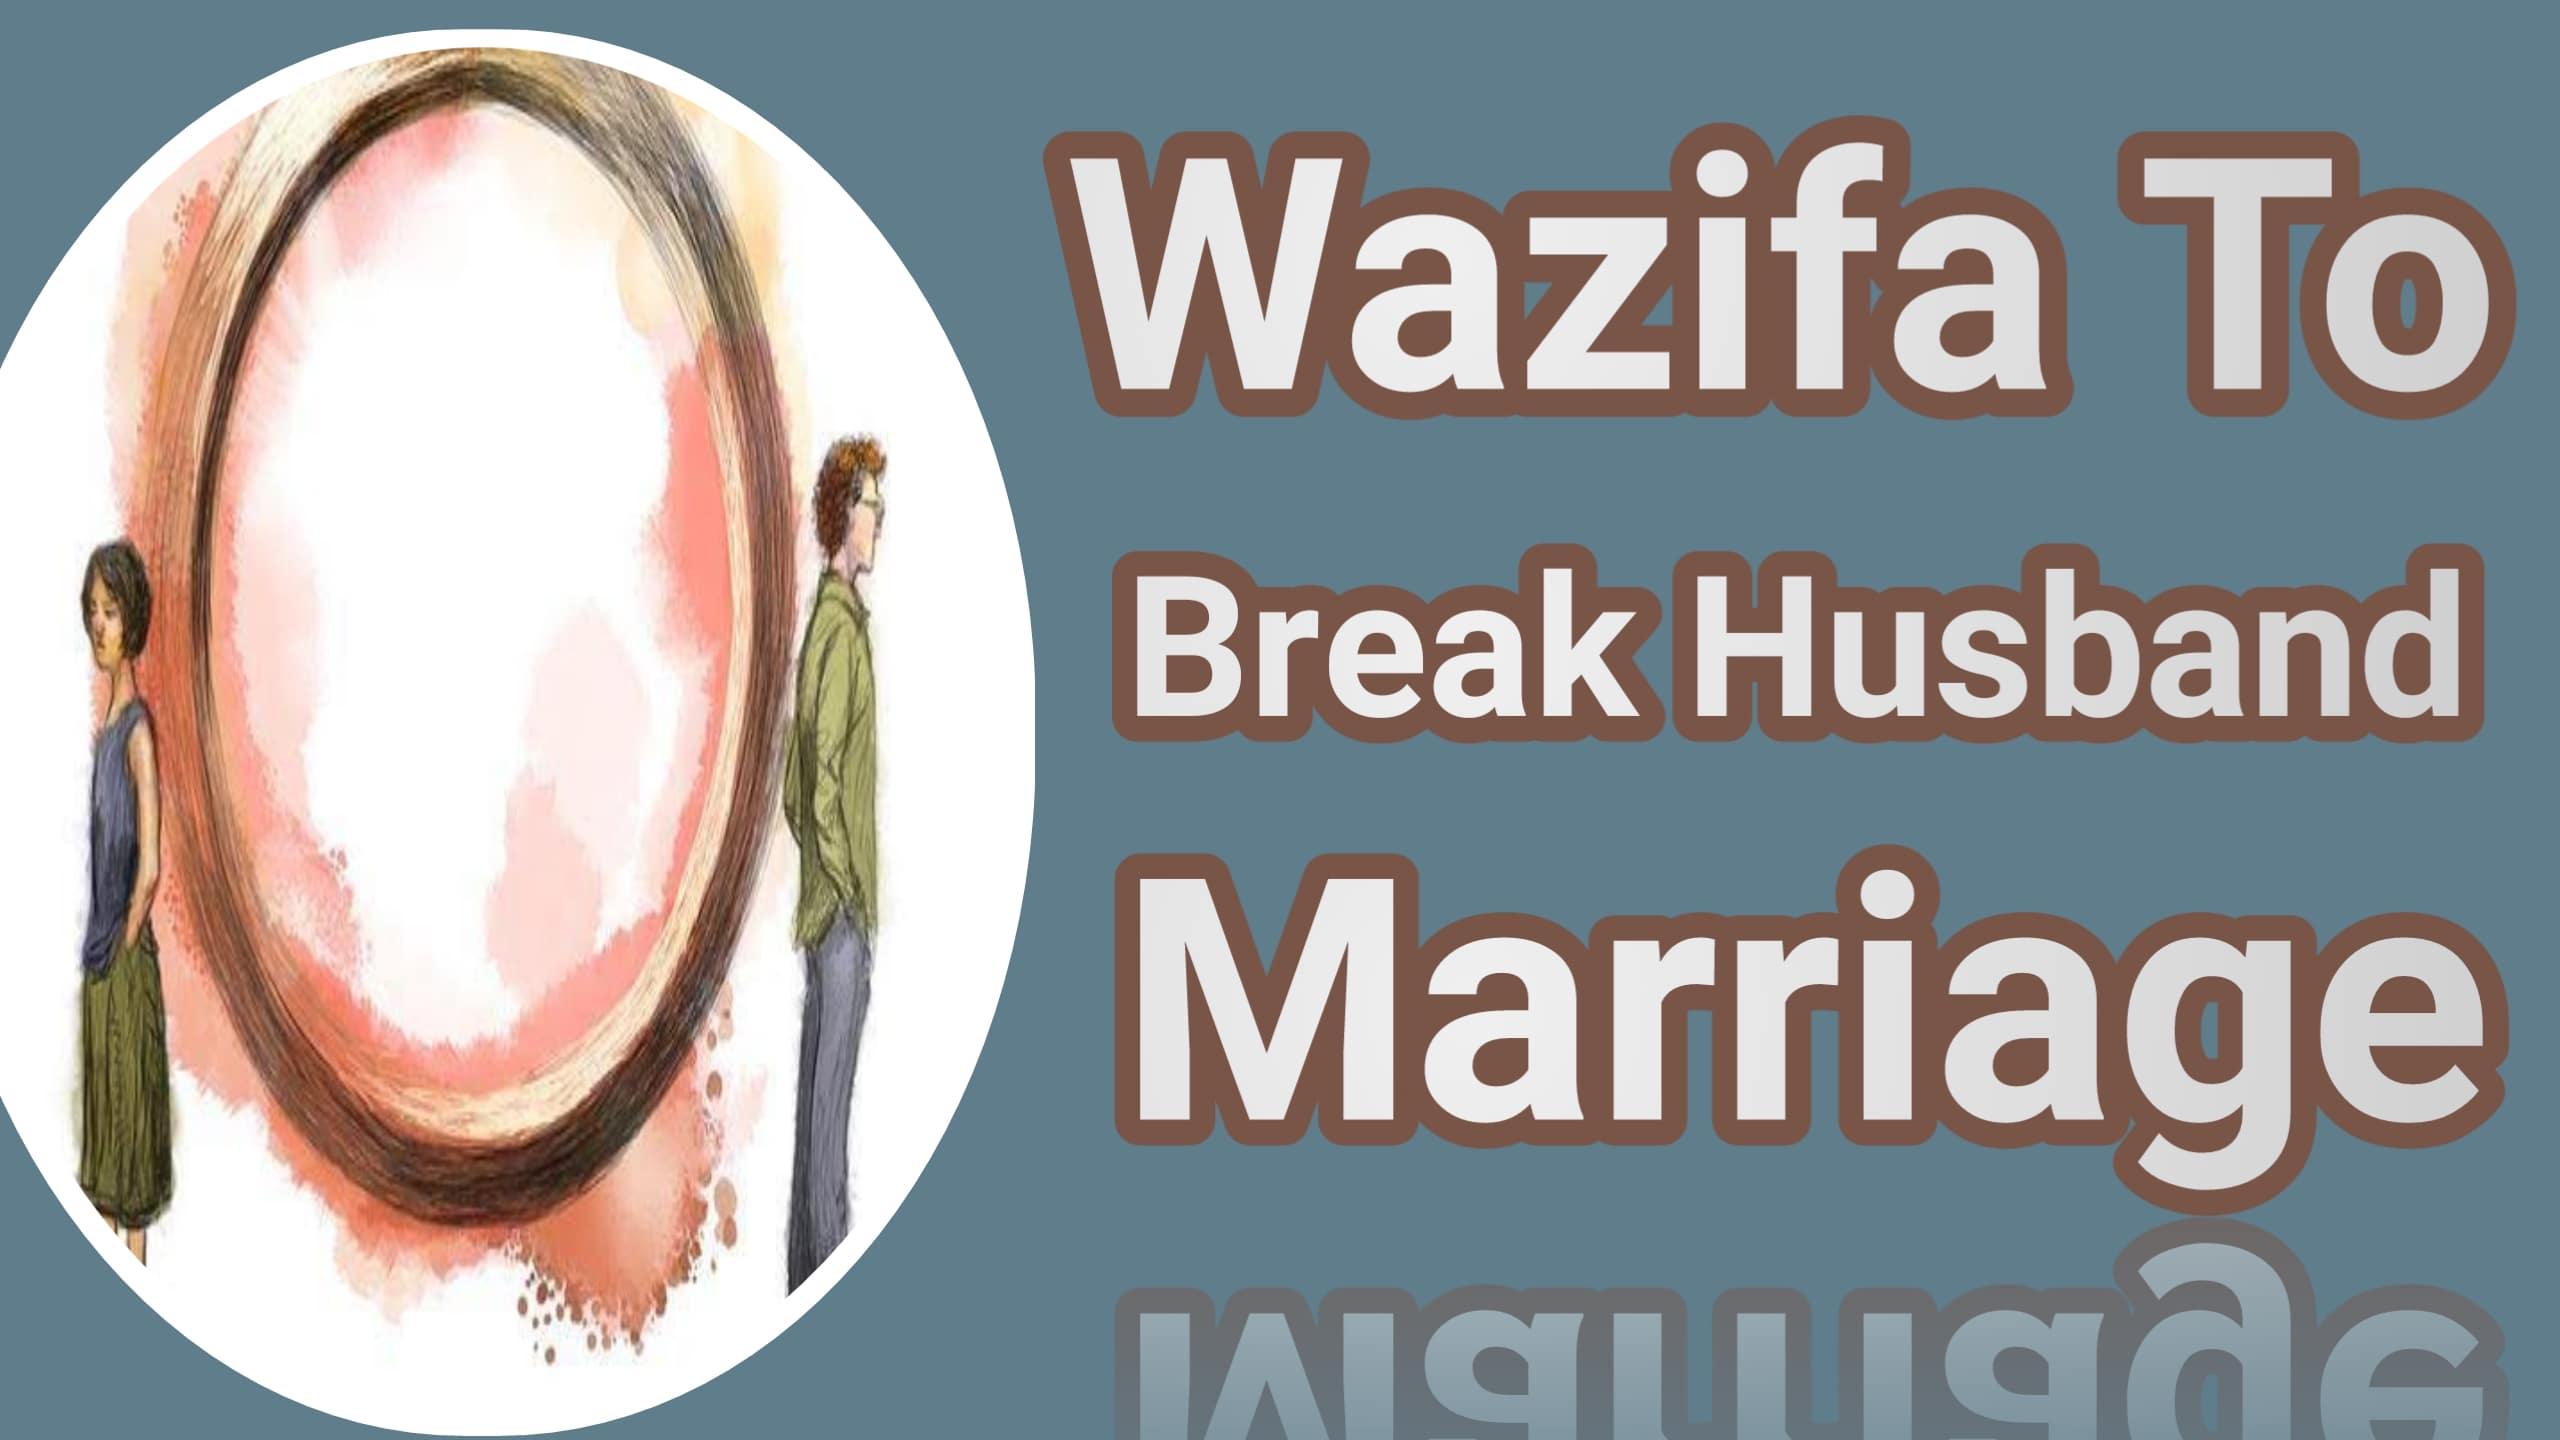 Wazifa to break husband marriage